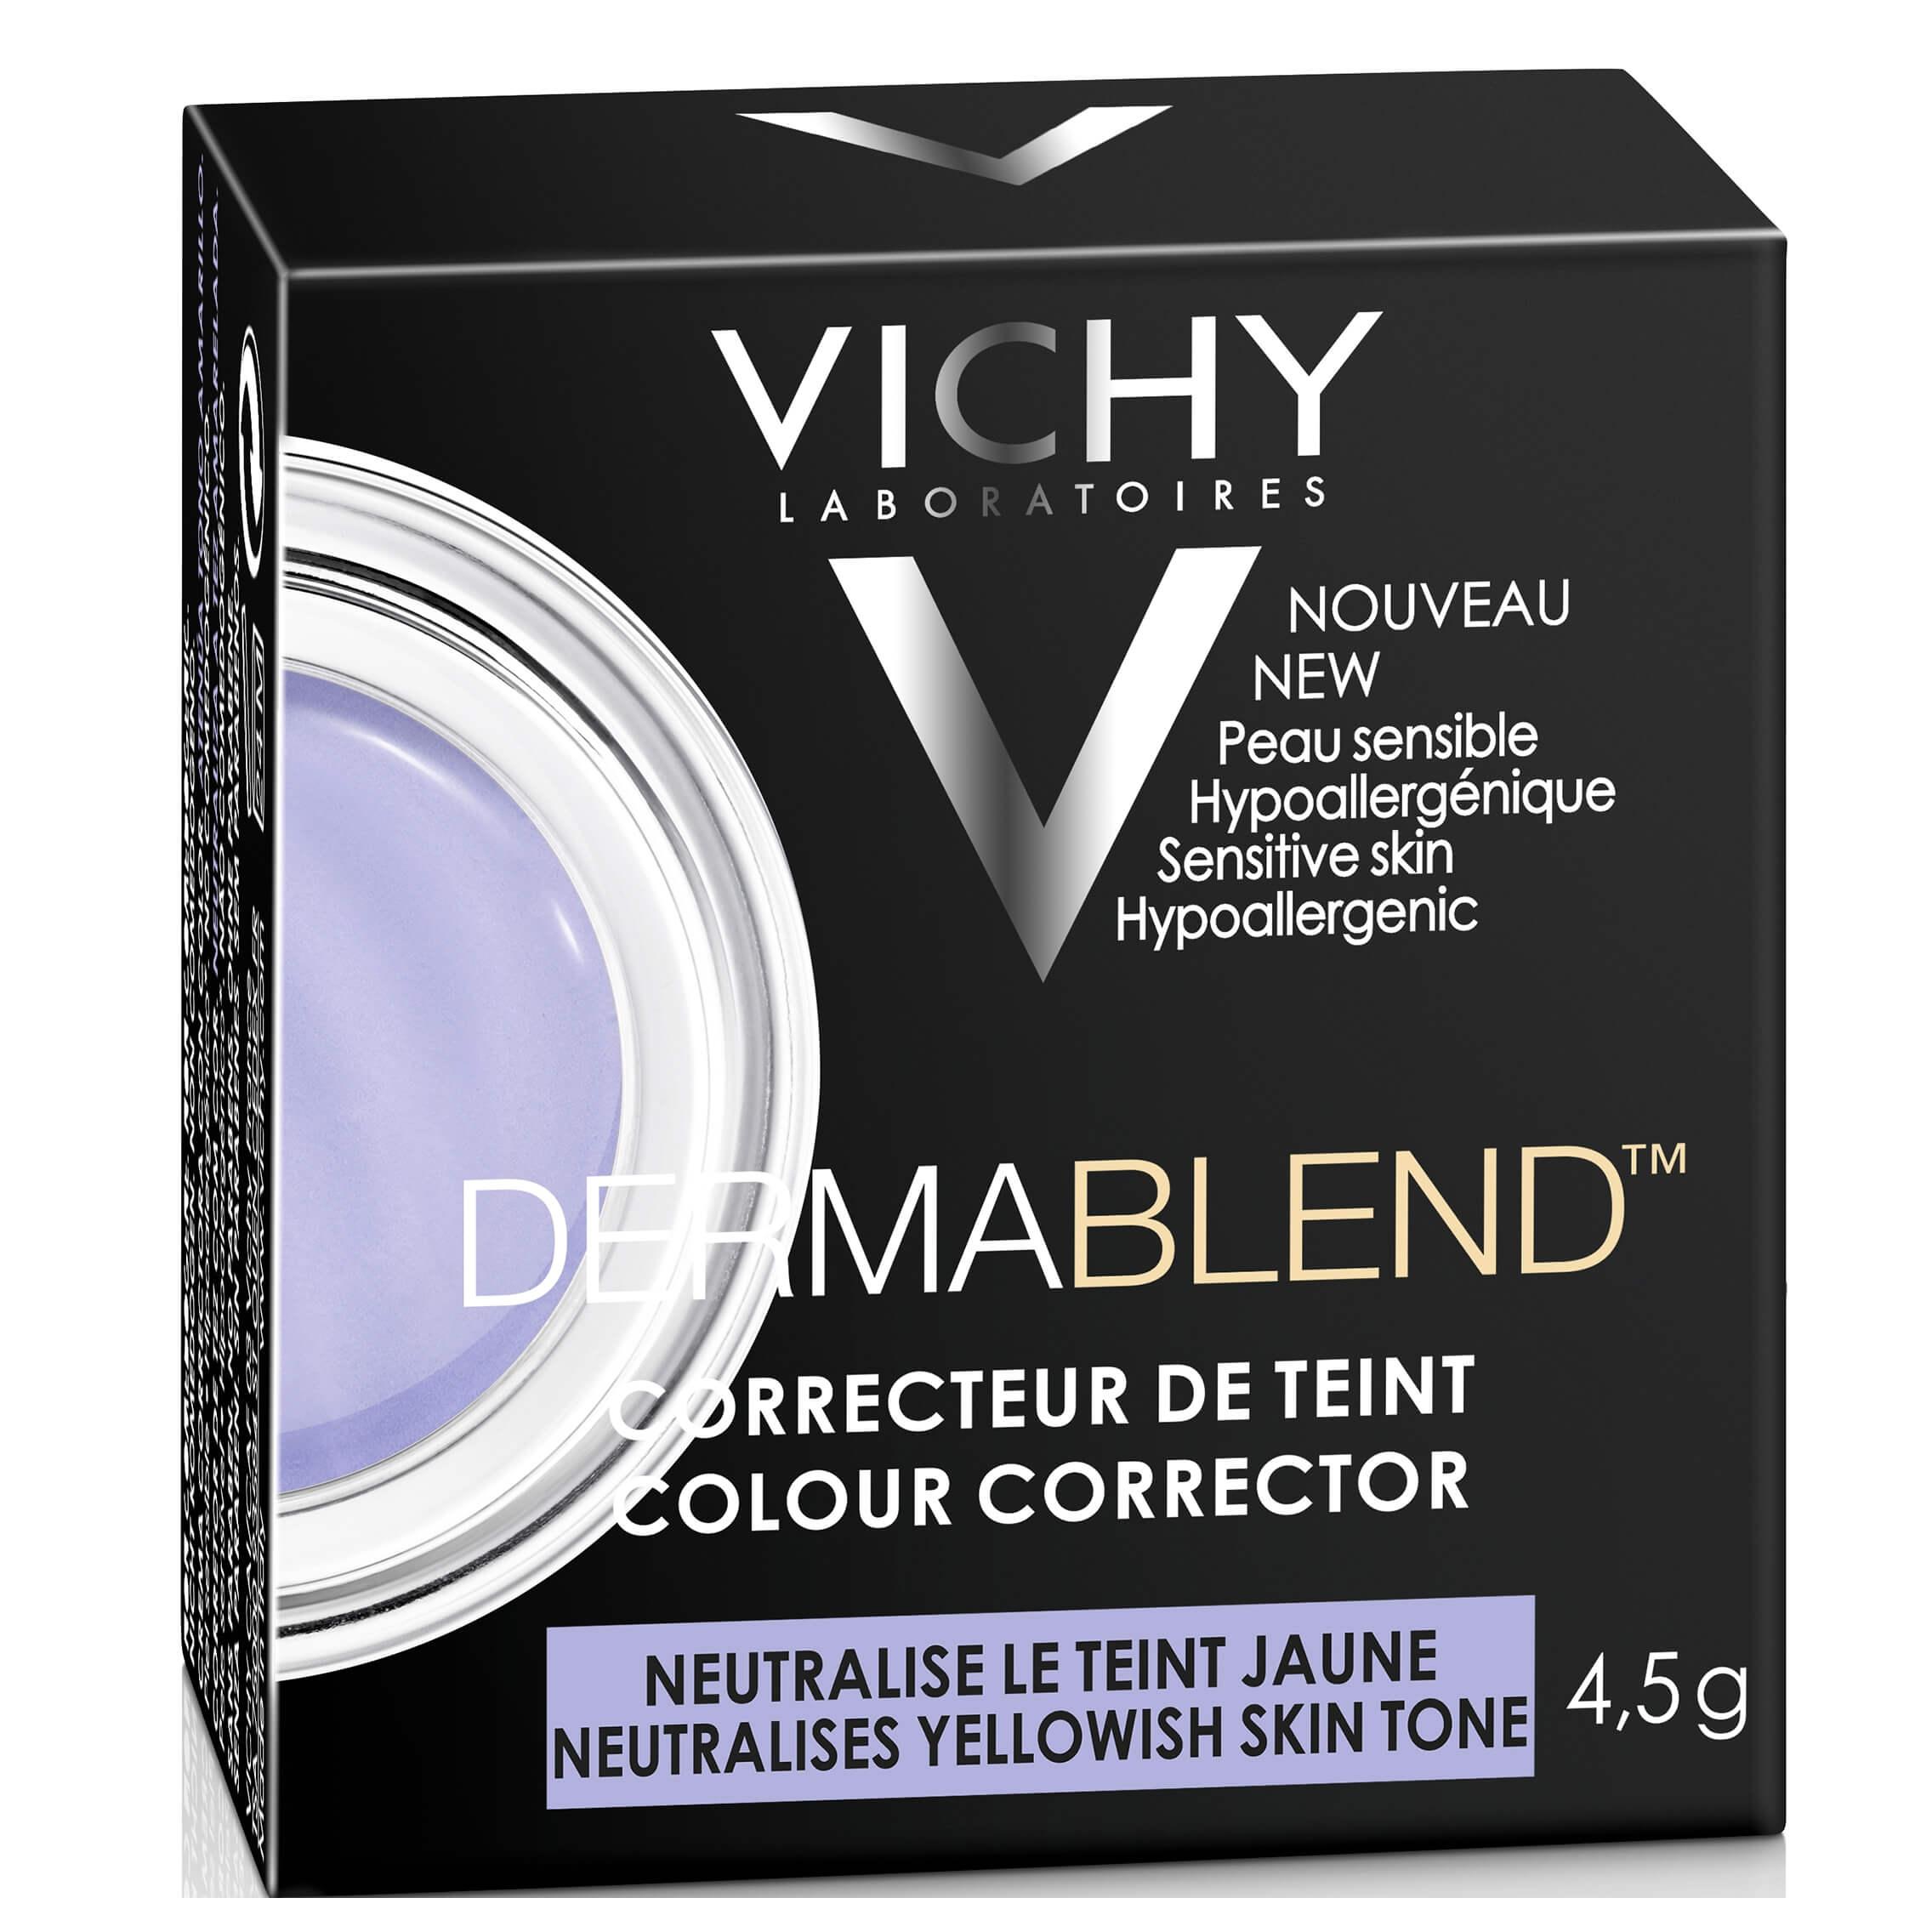 Vichy Dermablend Colour Corrector Εξουδετερώνει τις Ατέλειες στο Χρώμα του Δέρματος και Δημιουργεί μια Ομοιόμορφη Όψη 4,5g – Purple